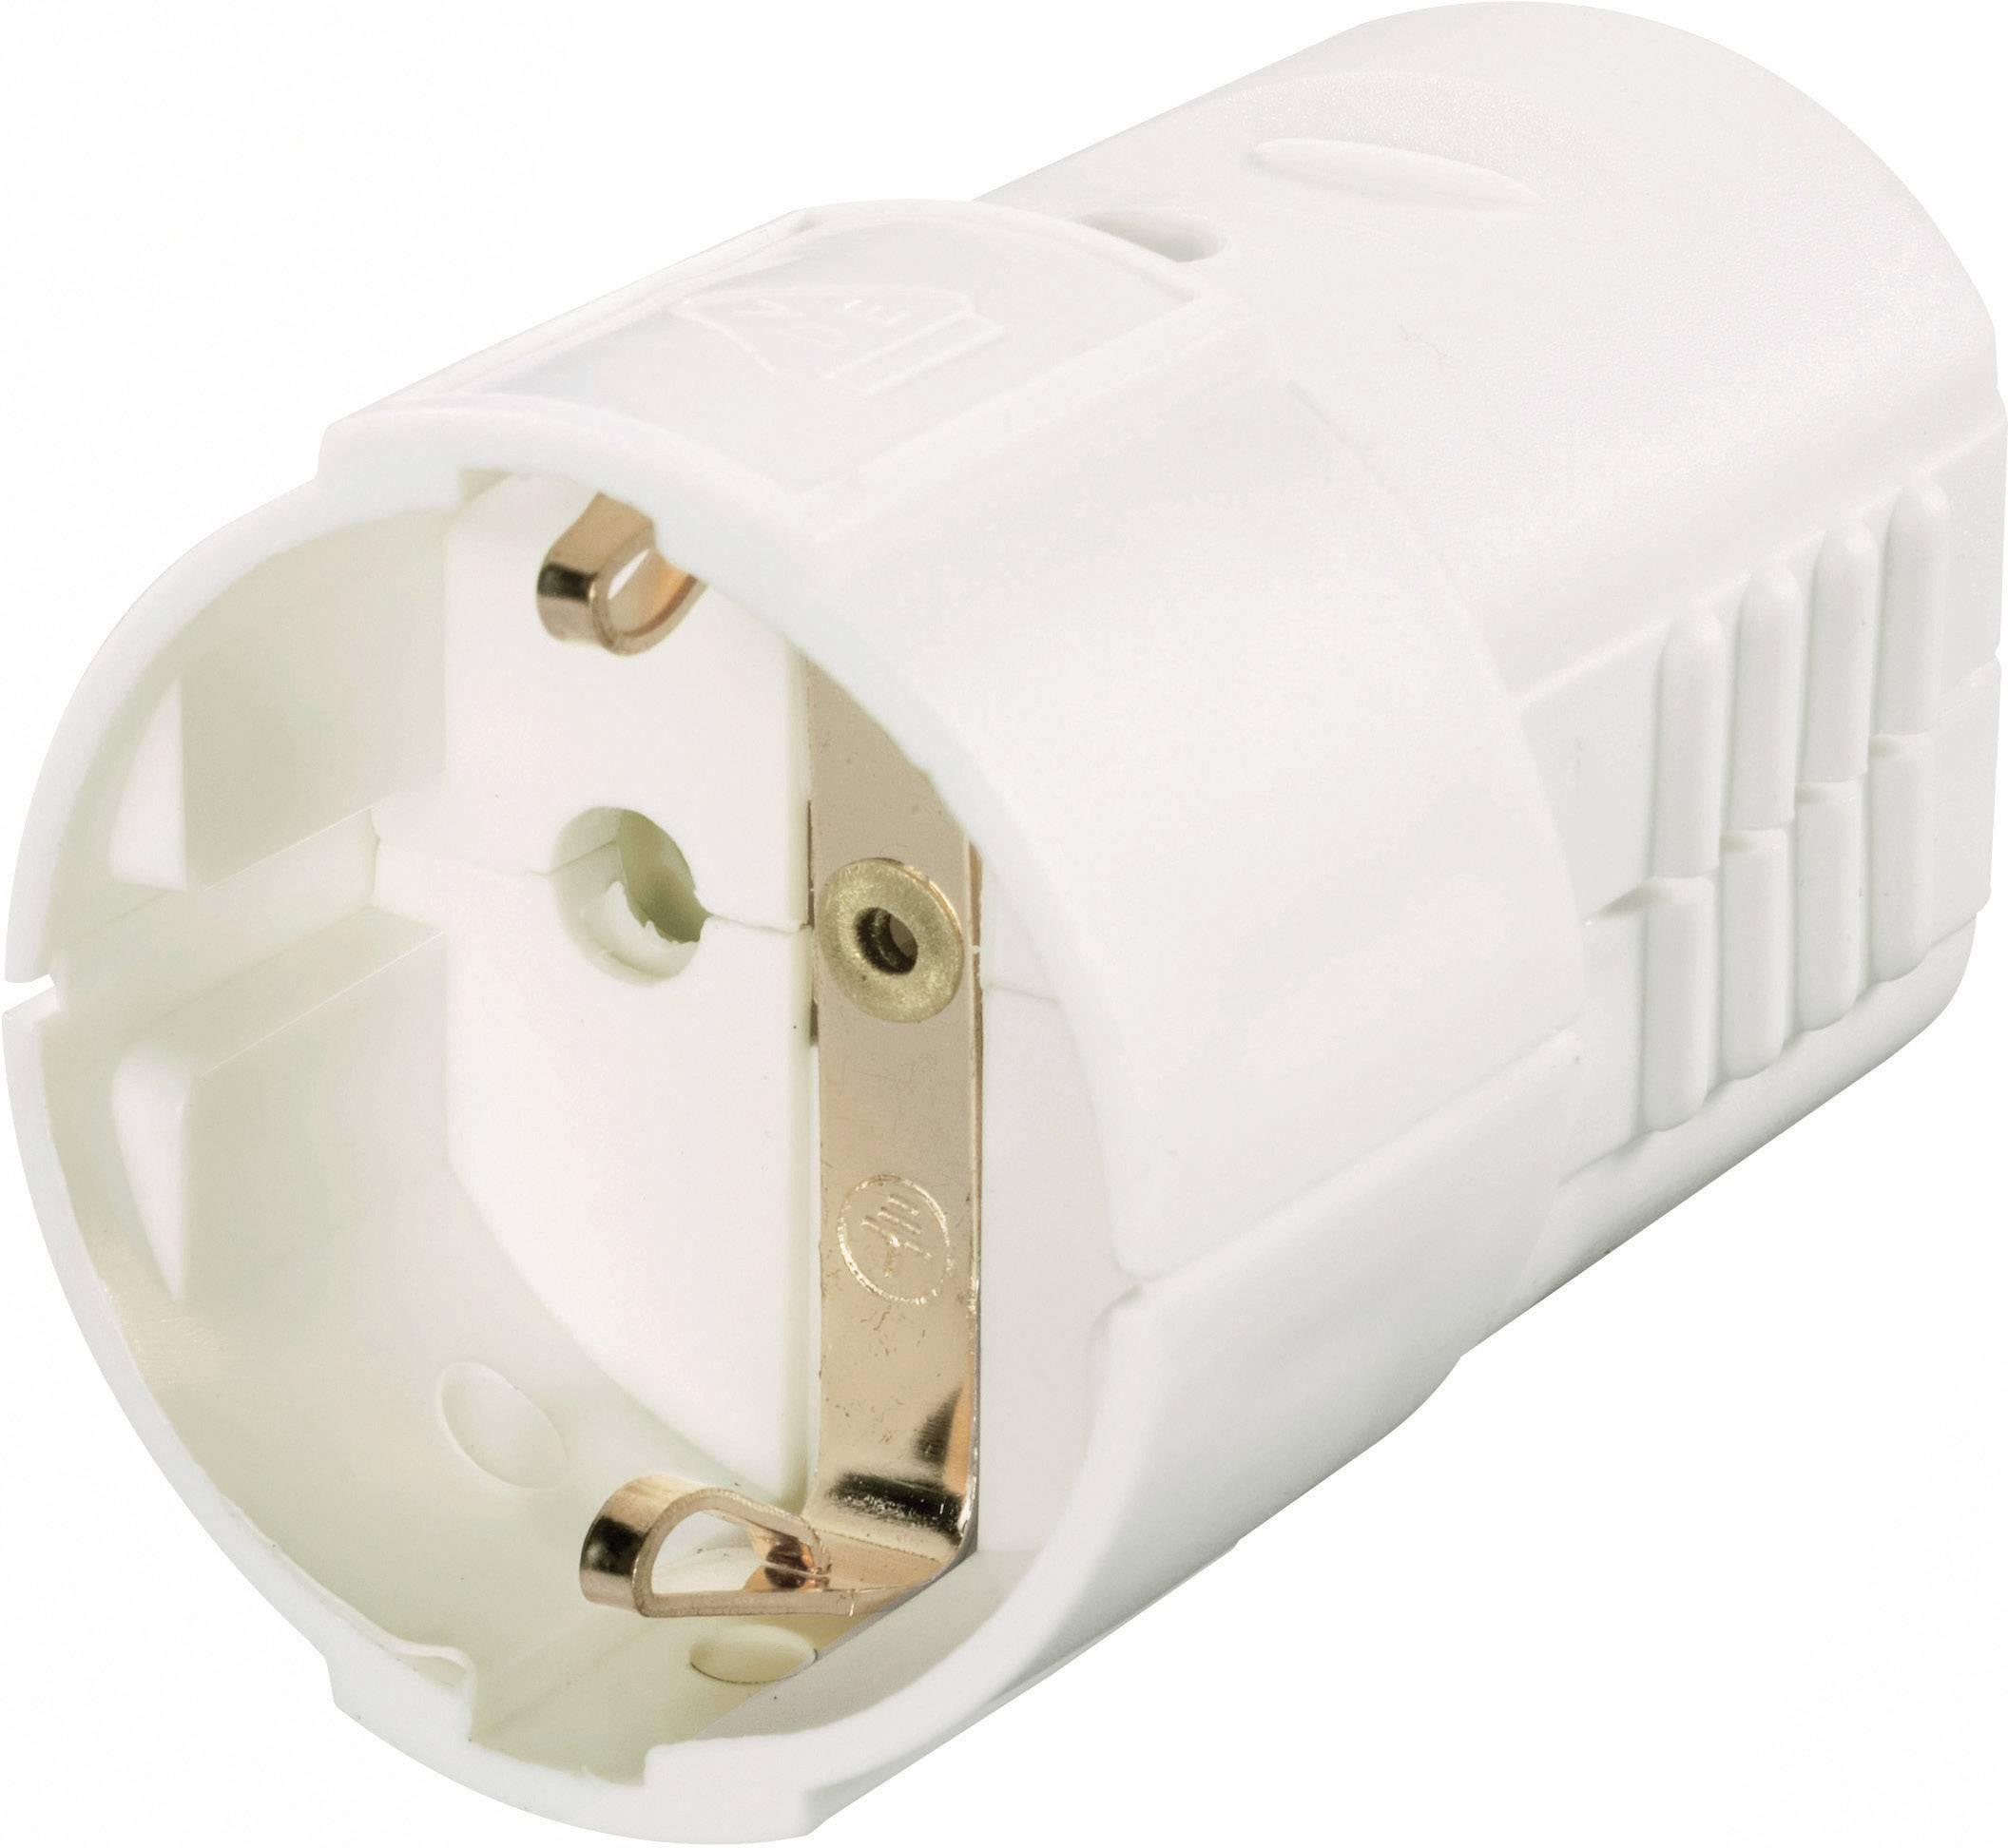 Prepojka SchuKo 627747, umelá hmota, IP20, 230 V, biela